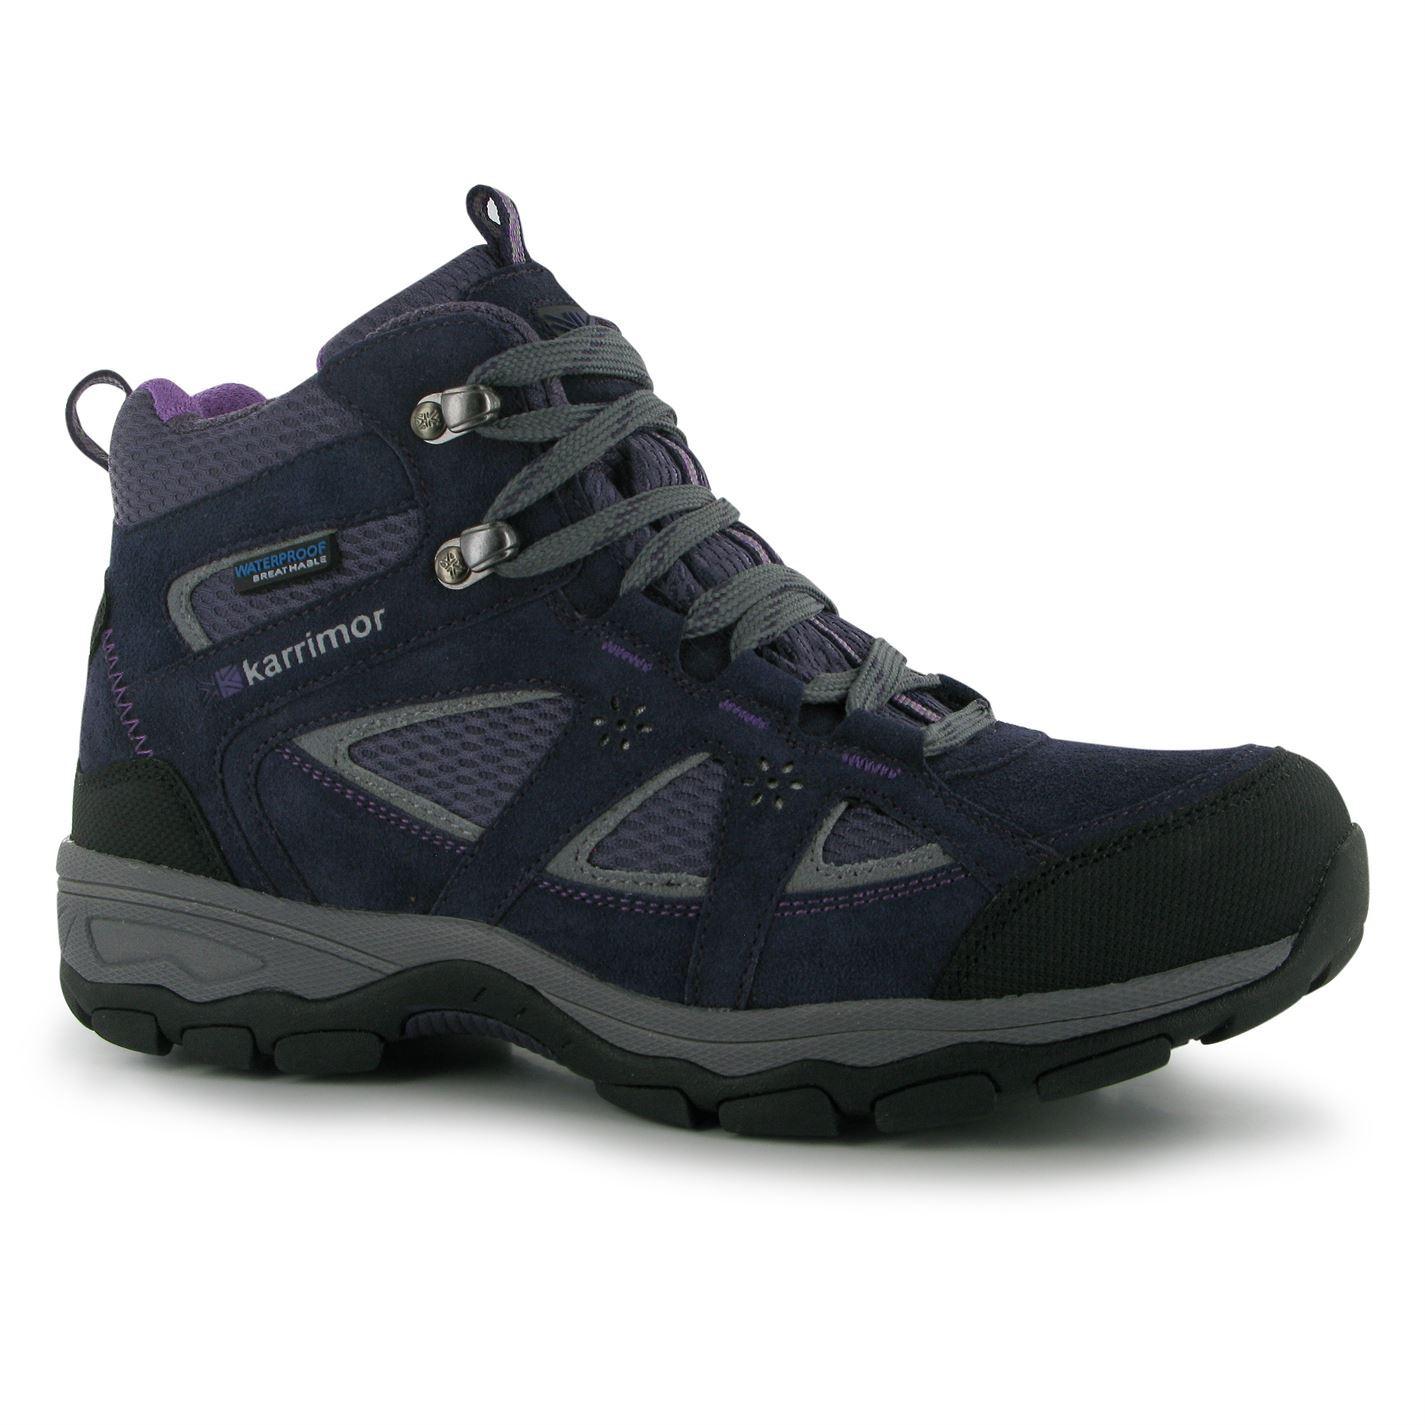 karrimor womens mountain mid top walking boots